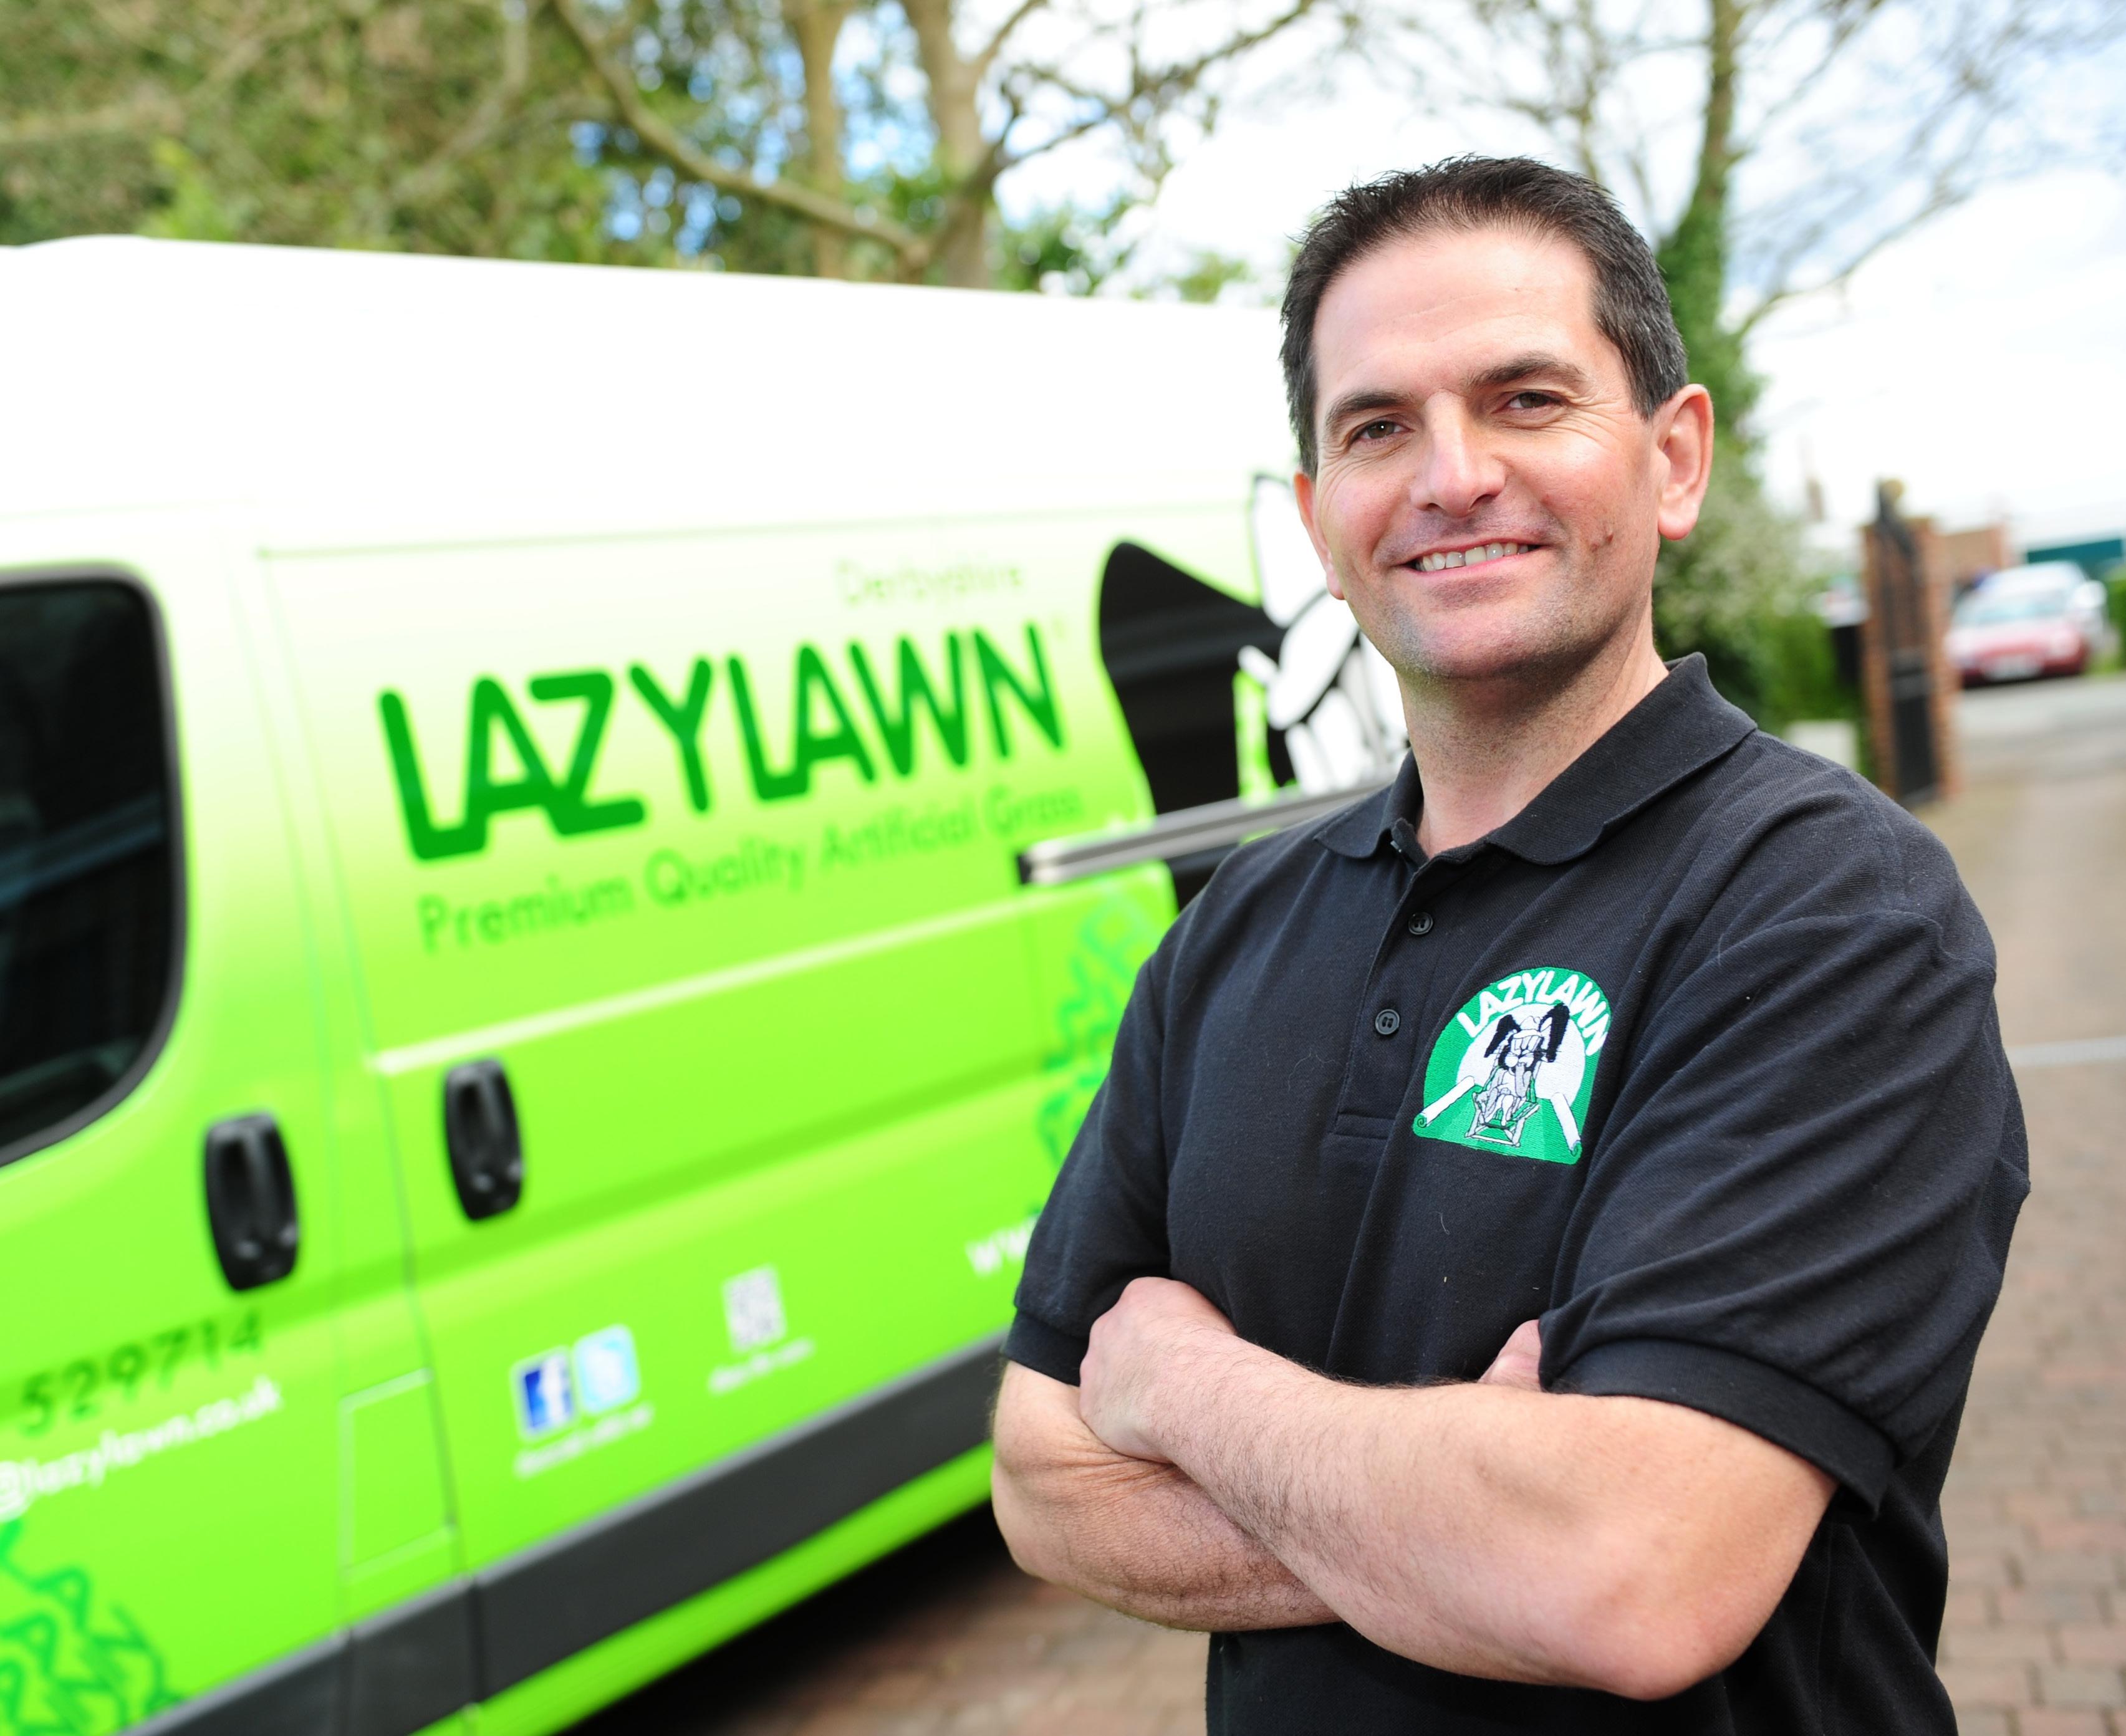 LazyLawn® North Manchester